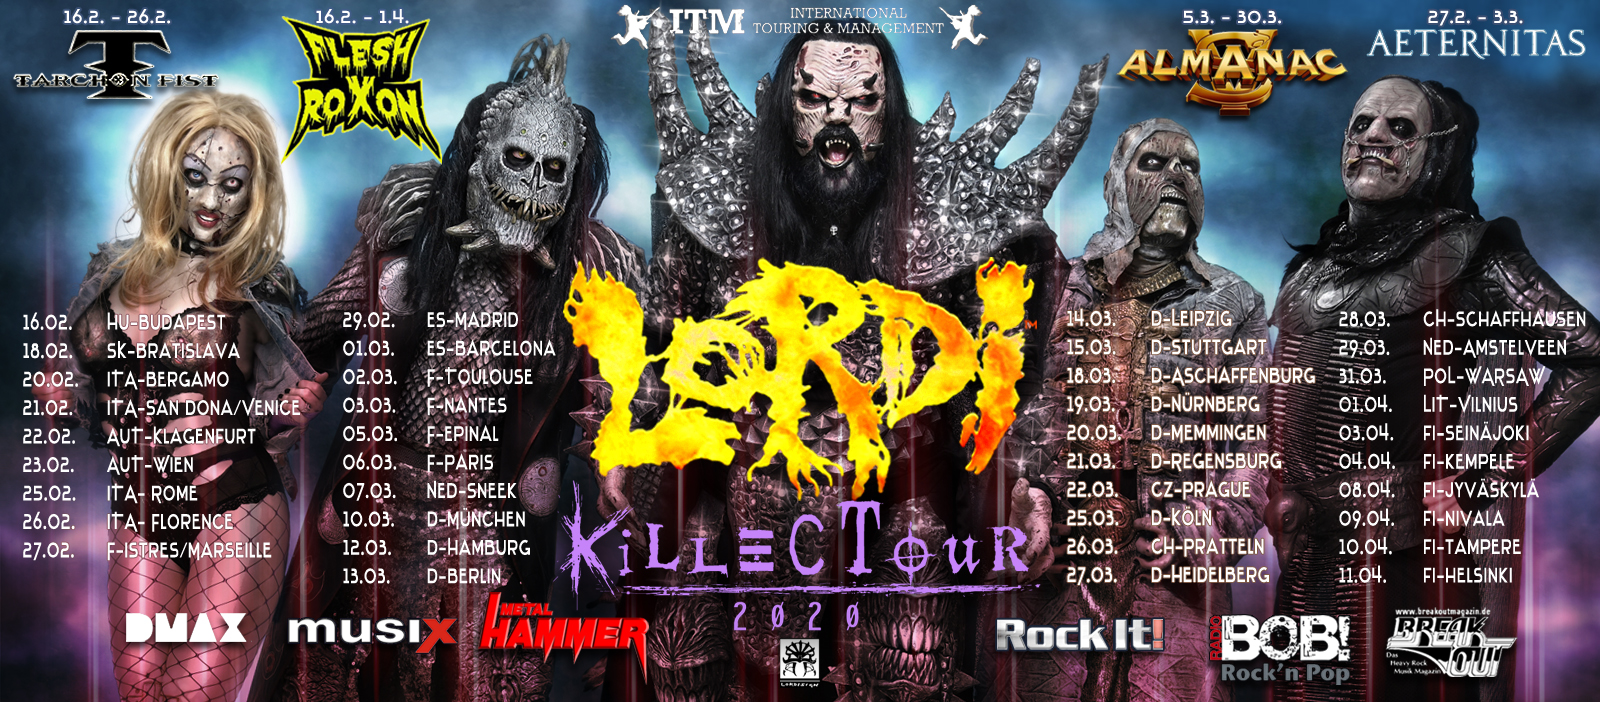 lordi-mit-neuem-album-killection-auf-tour